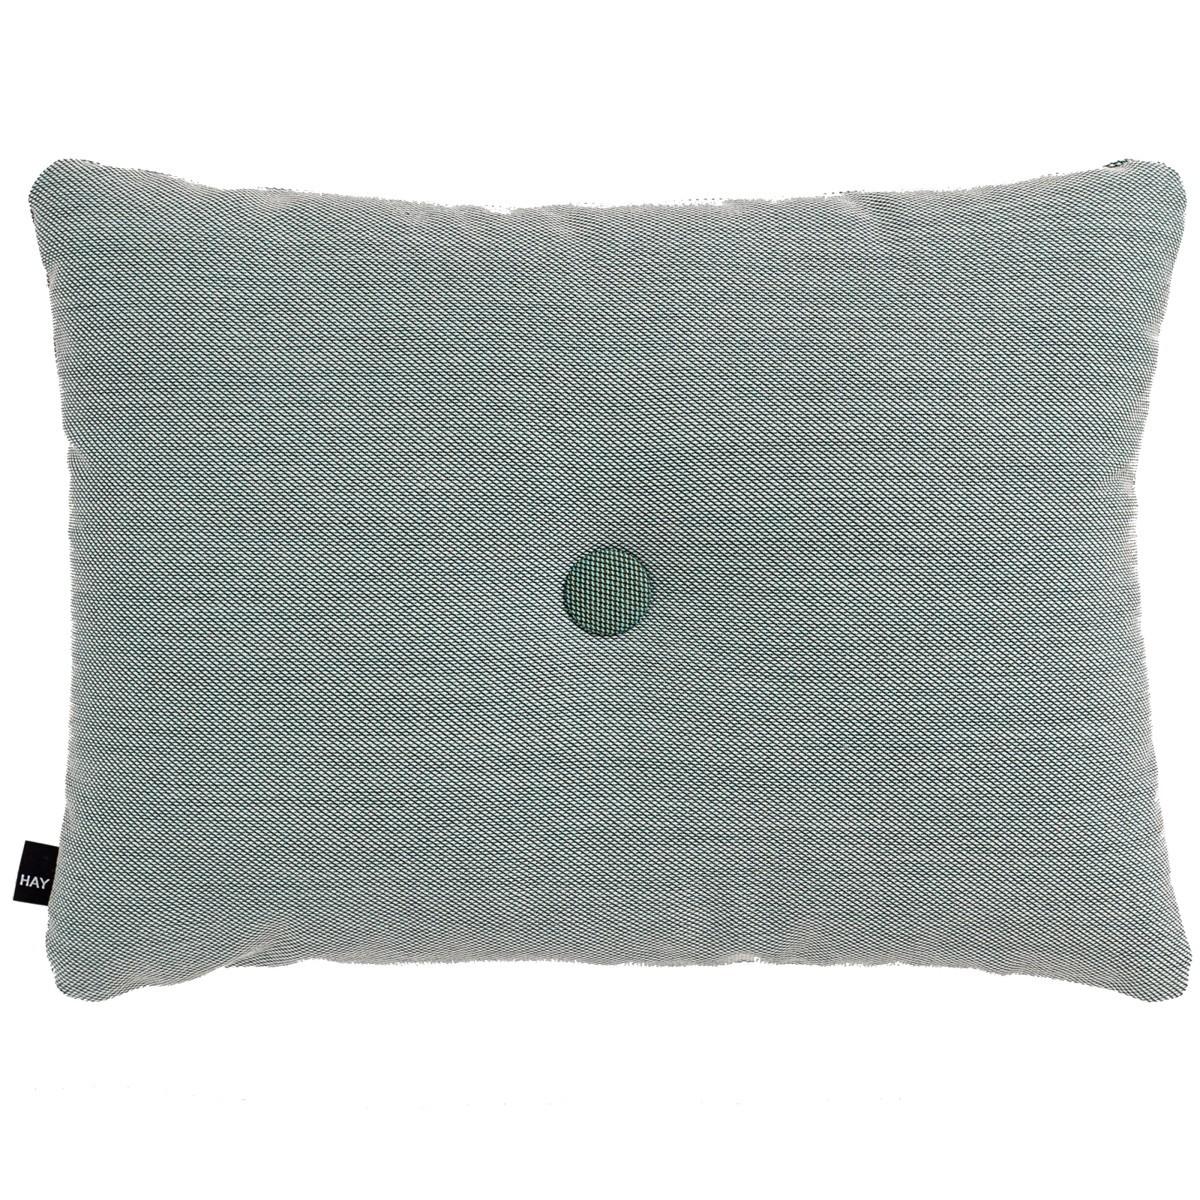 https://www.fundesign.nl/media/catalog/product/h/a/hay-dot-cushion-steelcut-trio-licht_groen.jpg